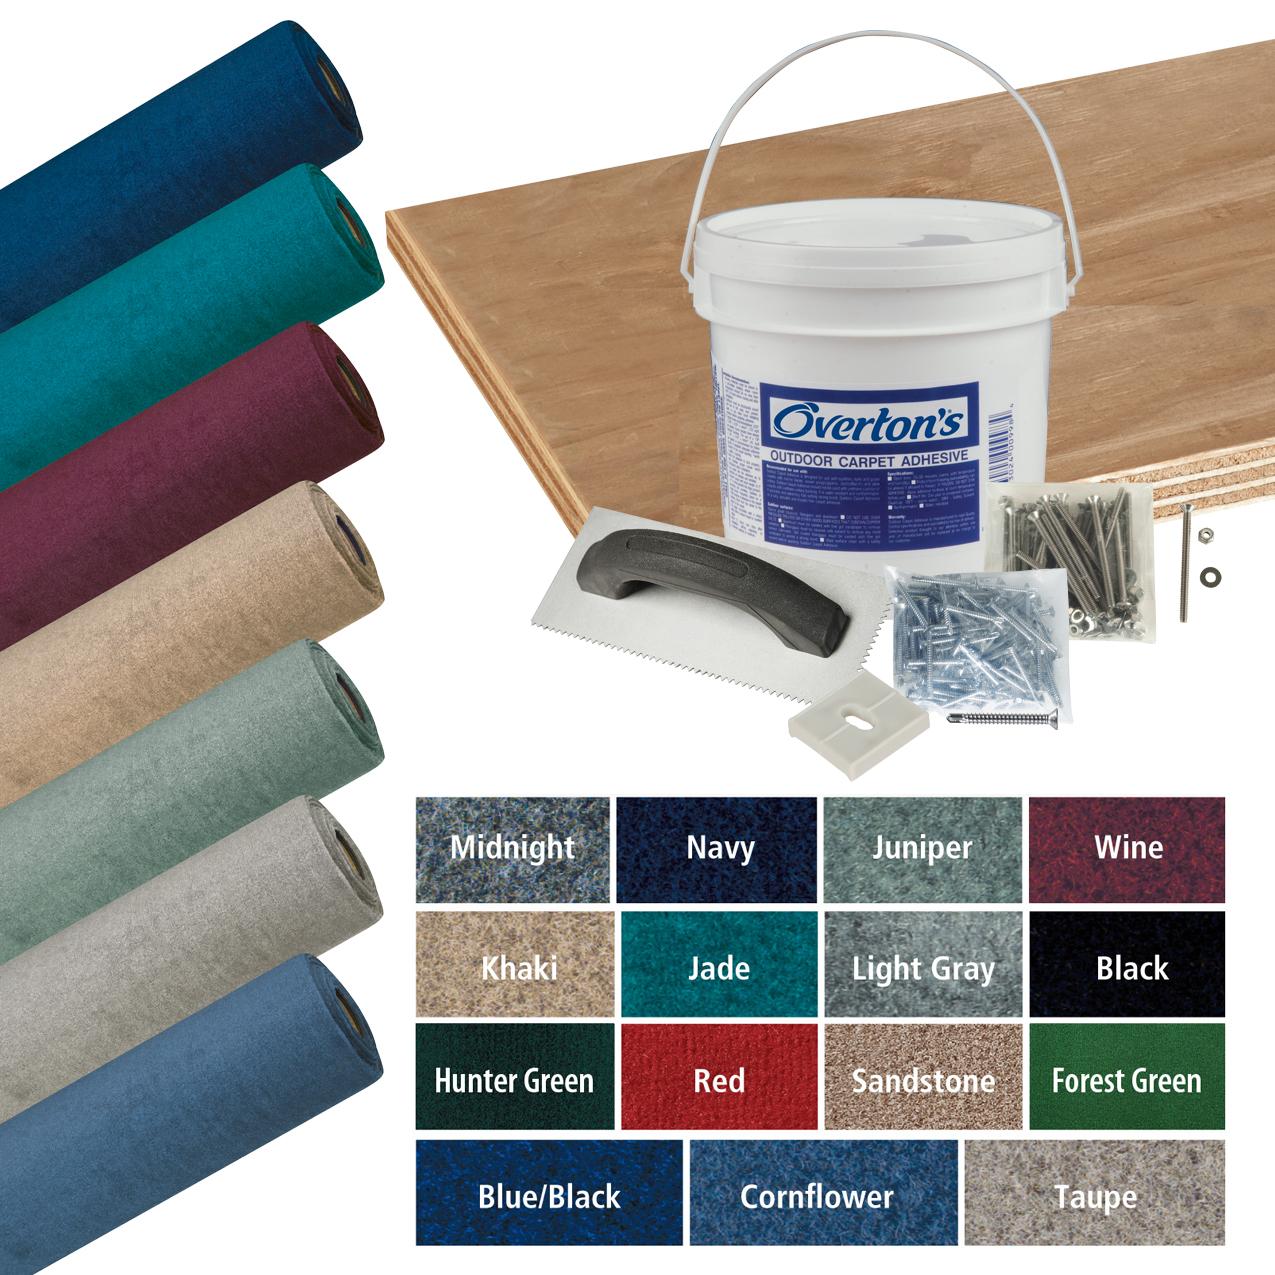 Overton's Daystar Carpet and Deck Kit, 8.5'W x 20'L